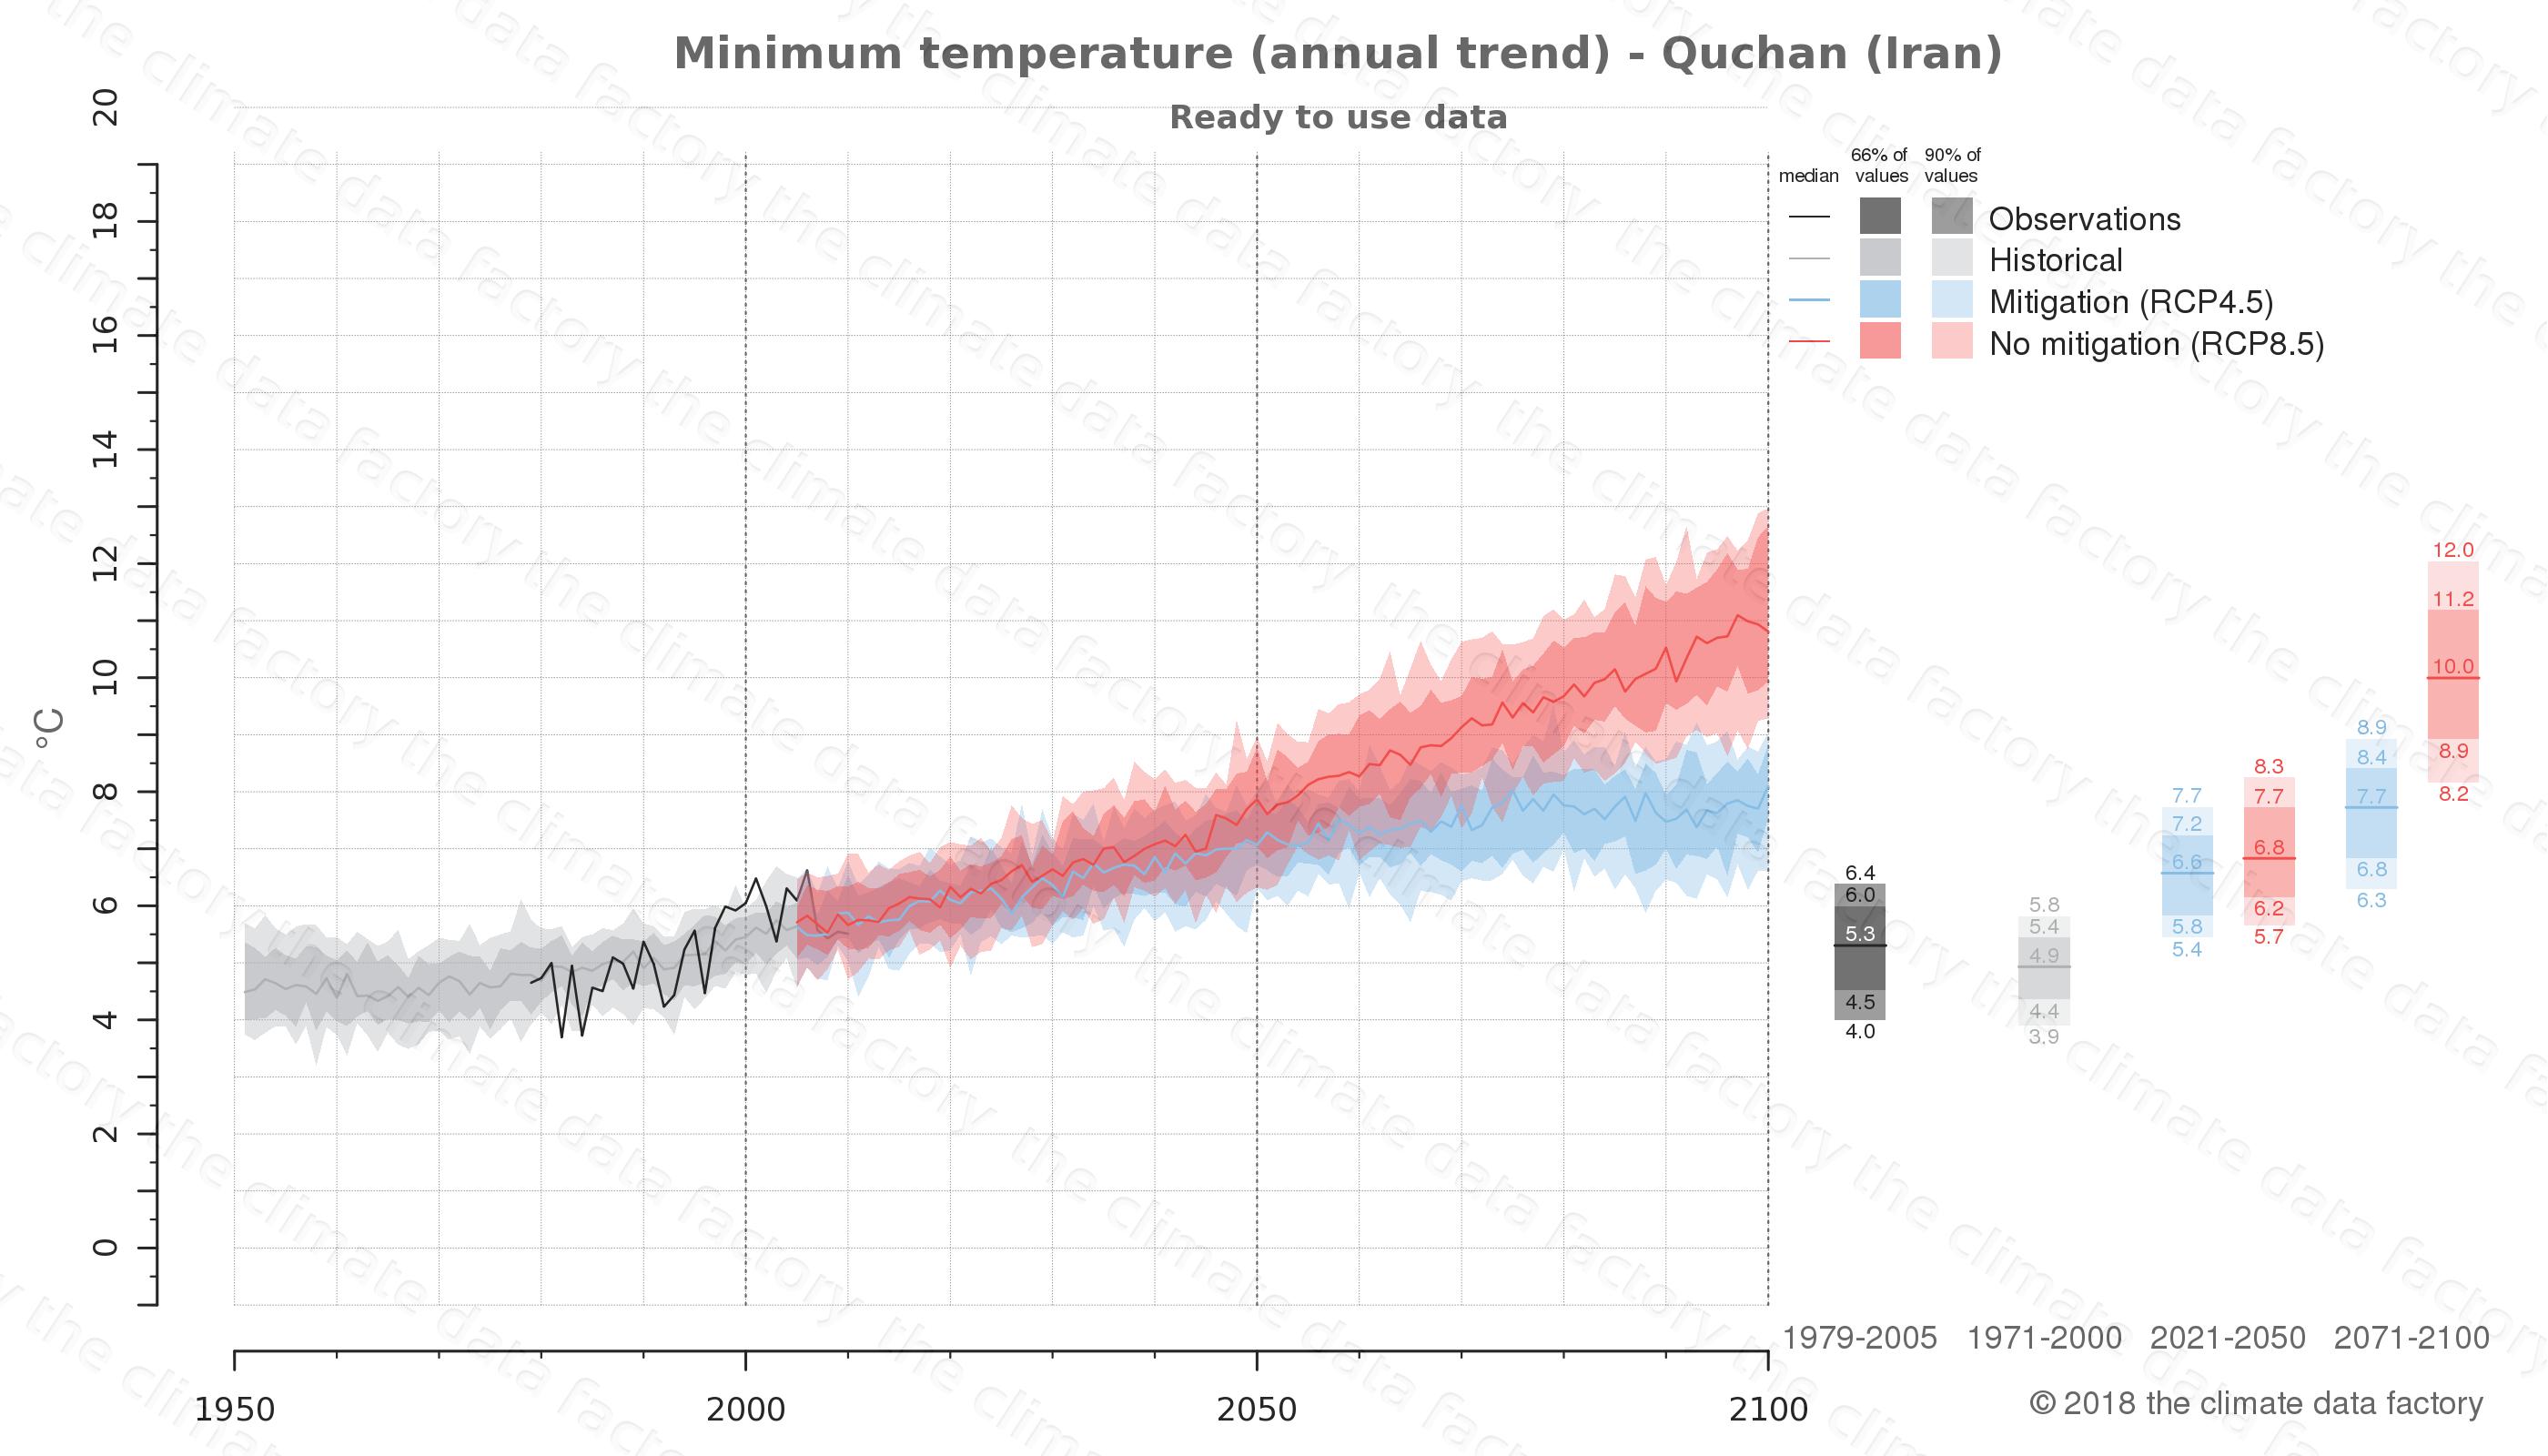 climate change data policy adaptation climate graph city data minimum-temperature quchan iran